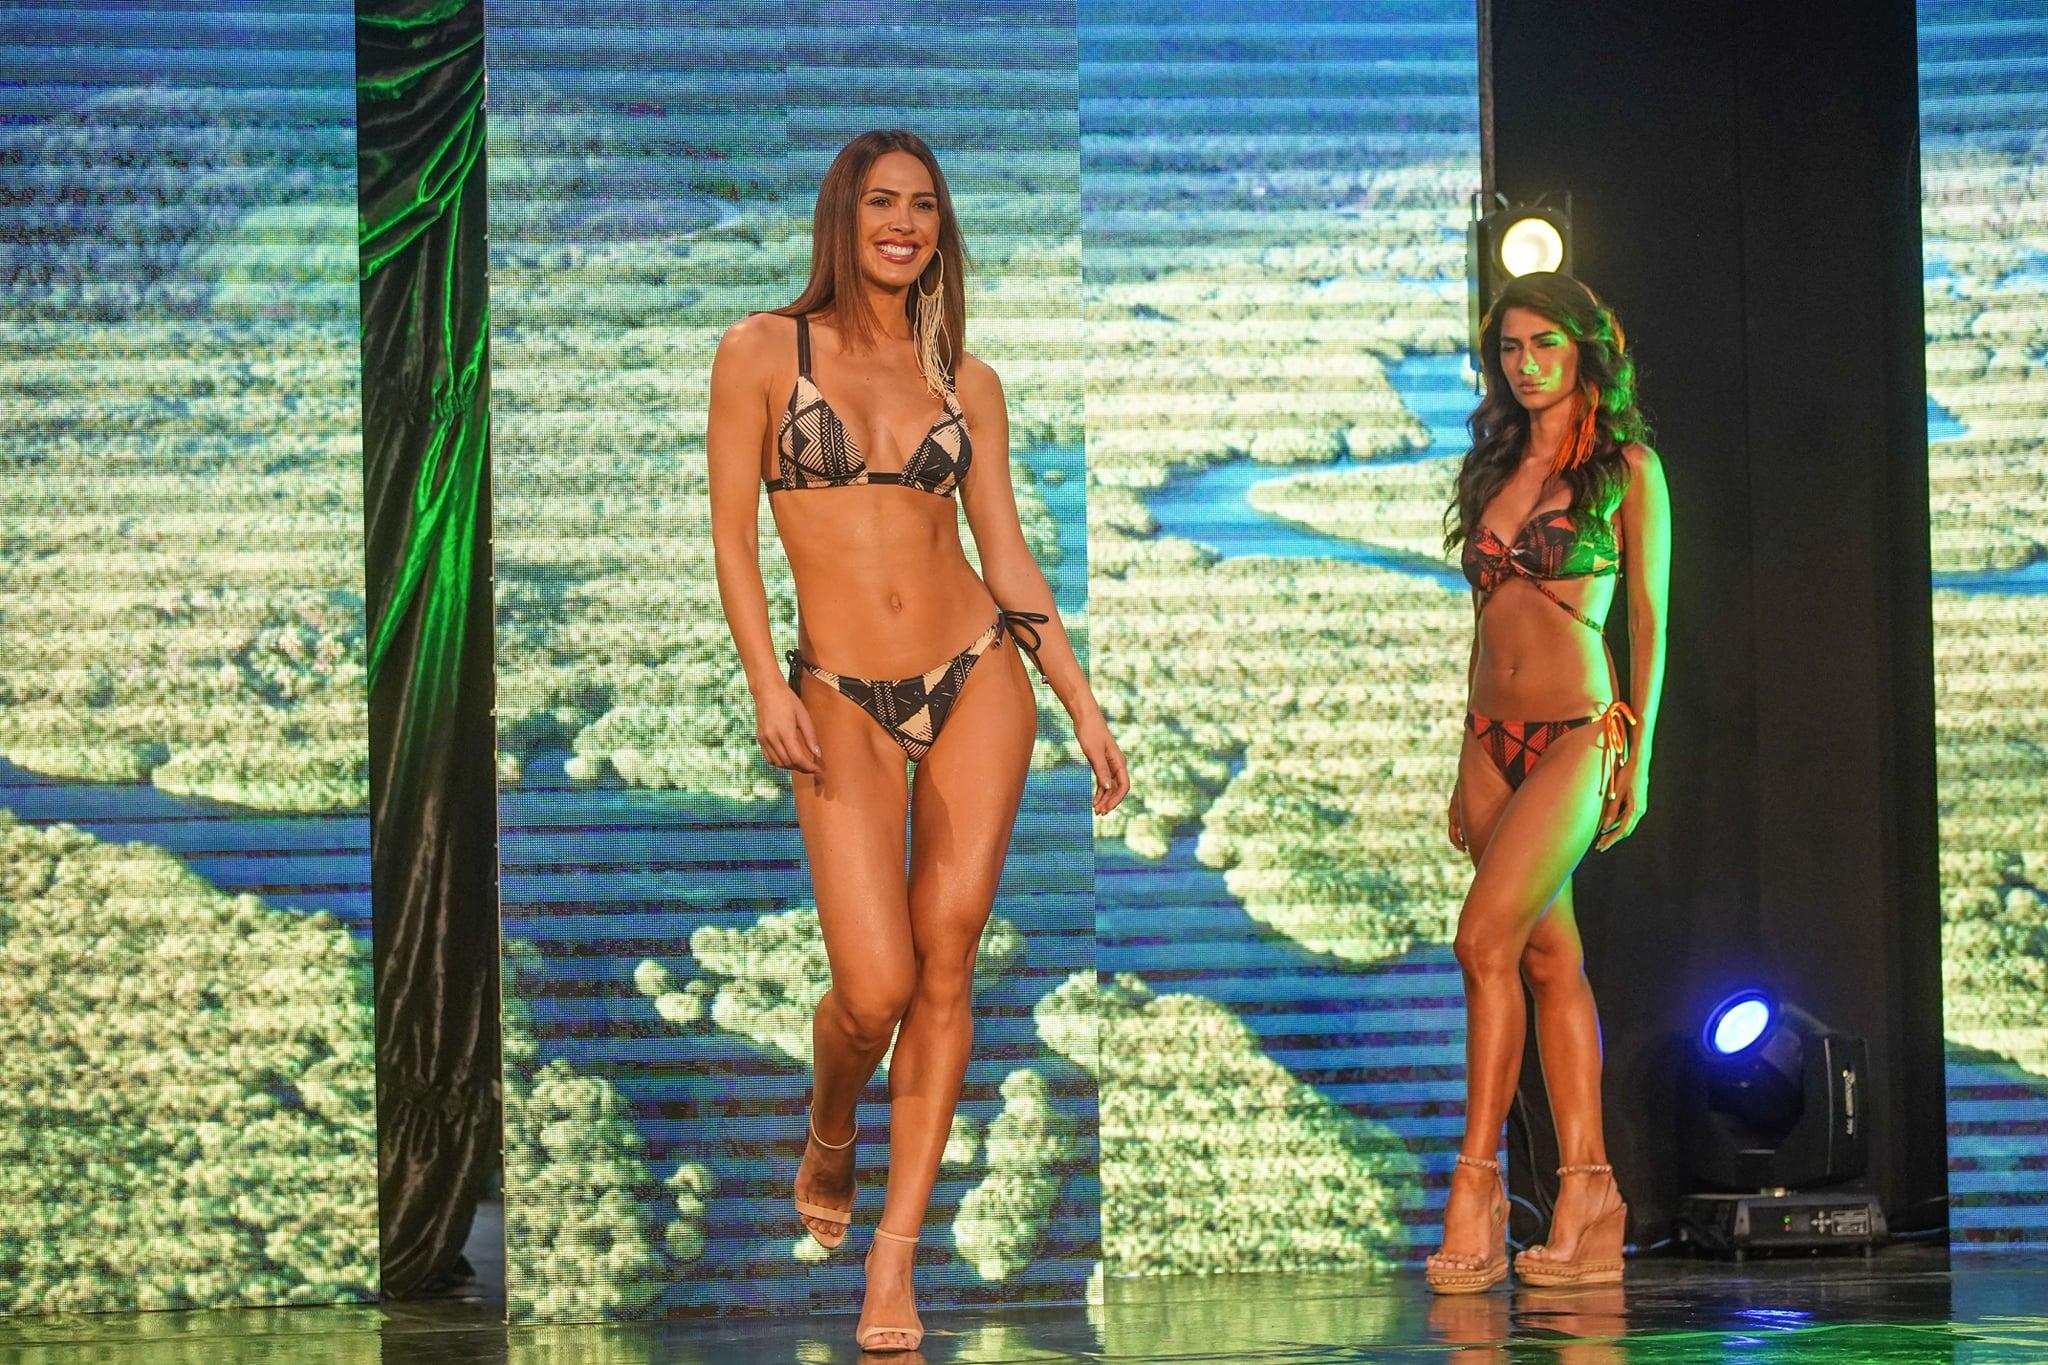 bruna zanardo, 1st runner-up de miss supranational brazil 2020/miss brasil internacional 2017/miss brasil terra 2016. - Página 18 12812811